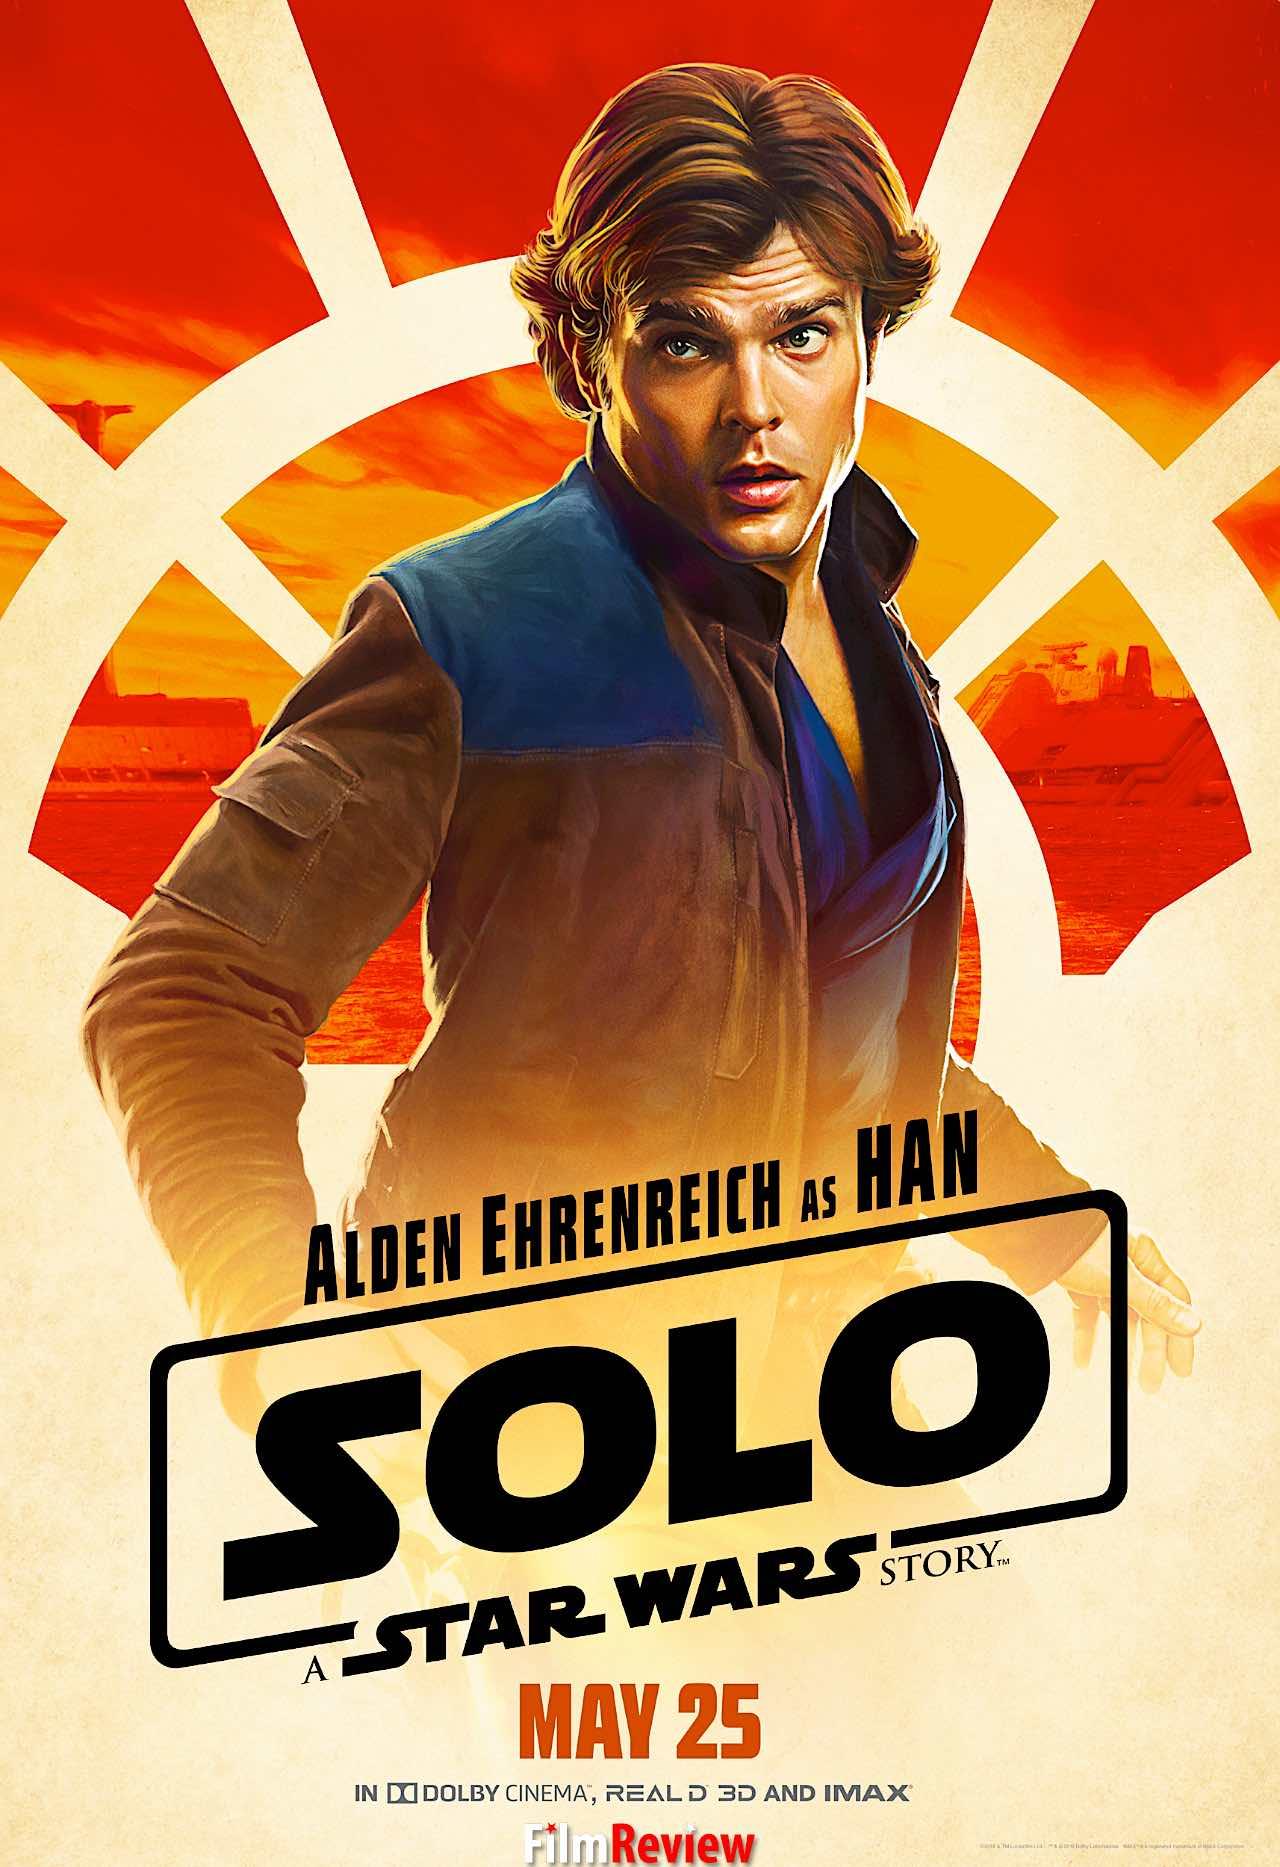 Solo: A Star Wars Story - Poster: Han Solo (Alden Ehrenreich) ©2018 Lucasfilm Ltd